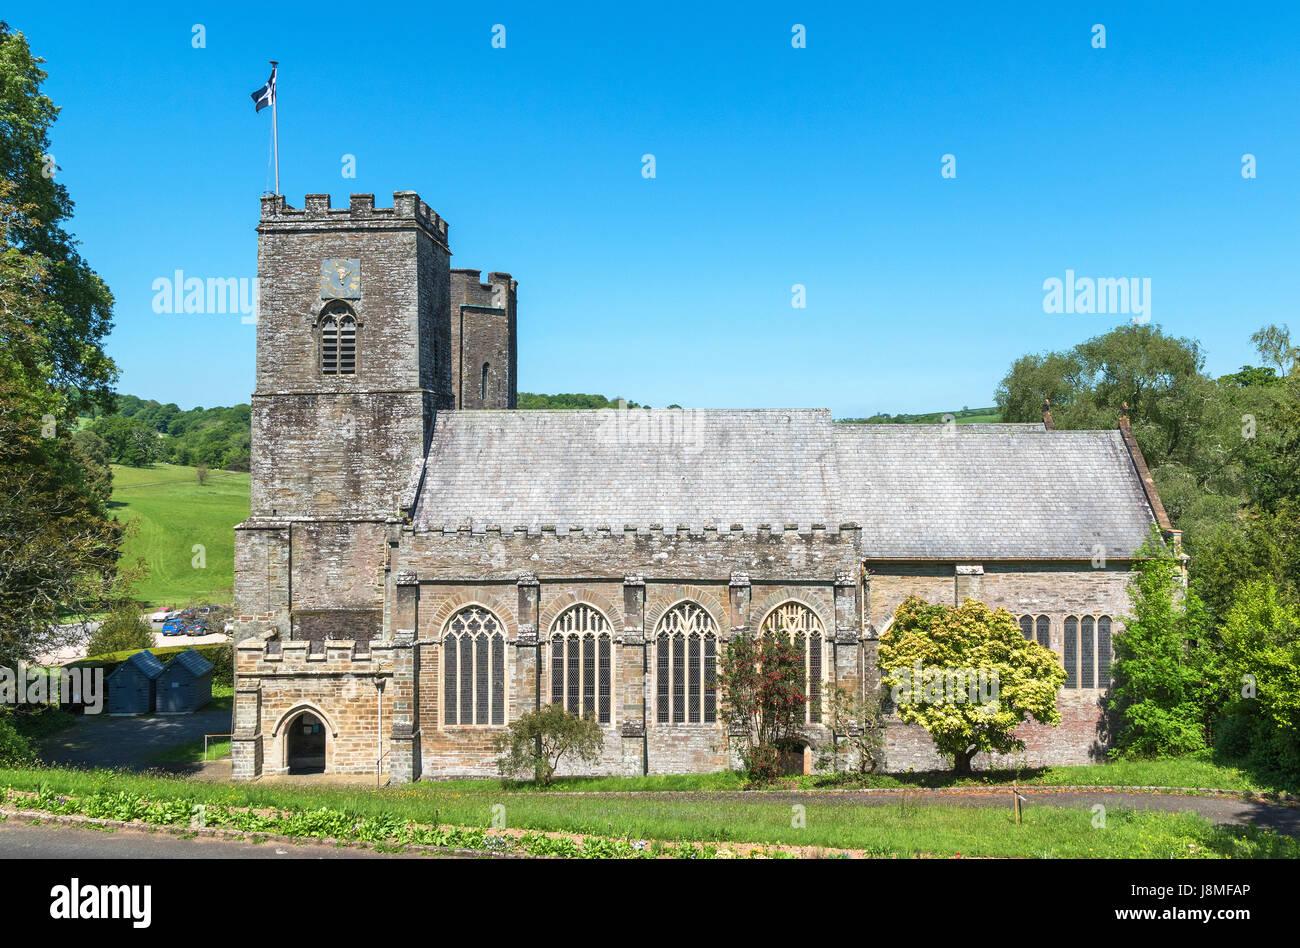 st.germans priory, parish village church, st.germans, cornwall, england, britain, uk - Stock Image